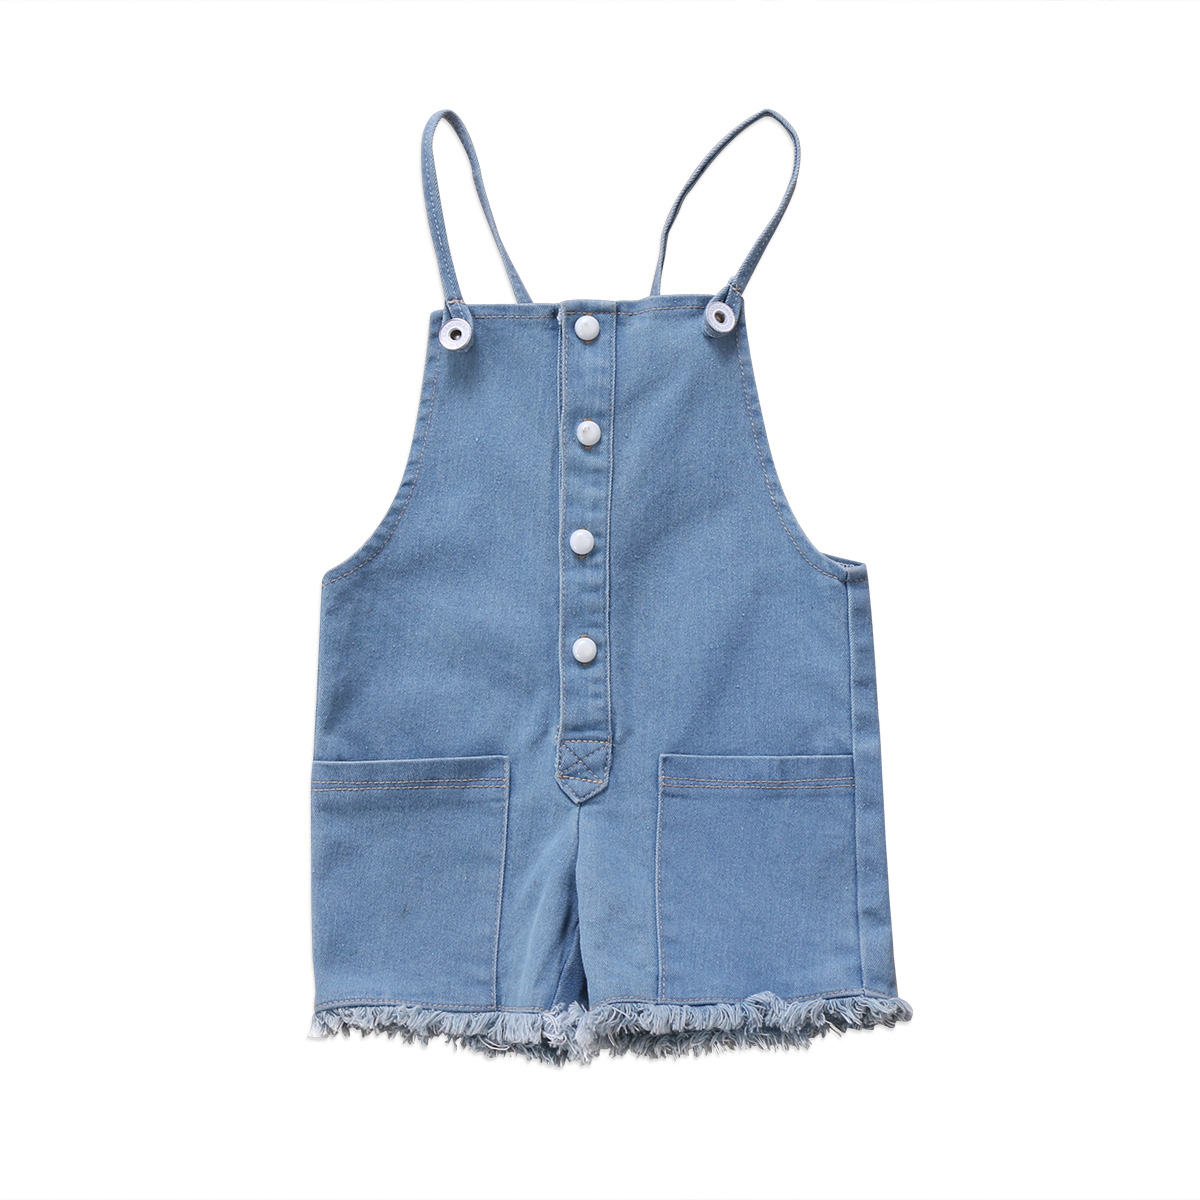 0-24M Newborn Baby Kid Girls Denim One-piece Romper Babies Girl Button Strap Bib Jumpsuit Outfits Clothing